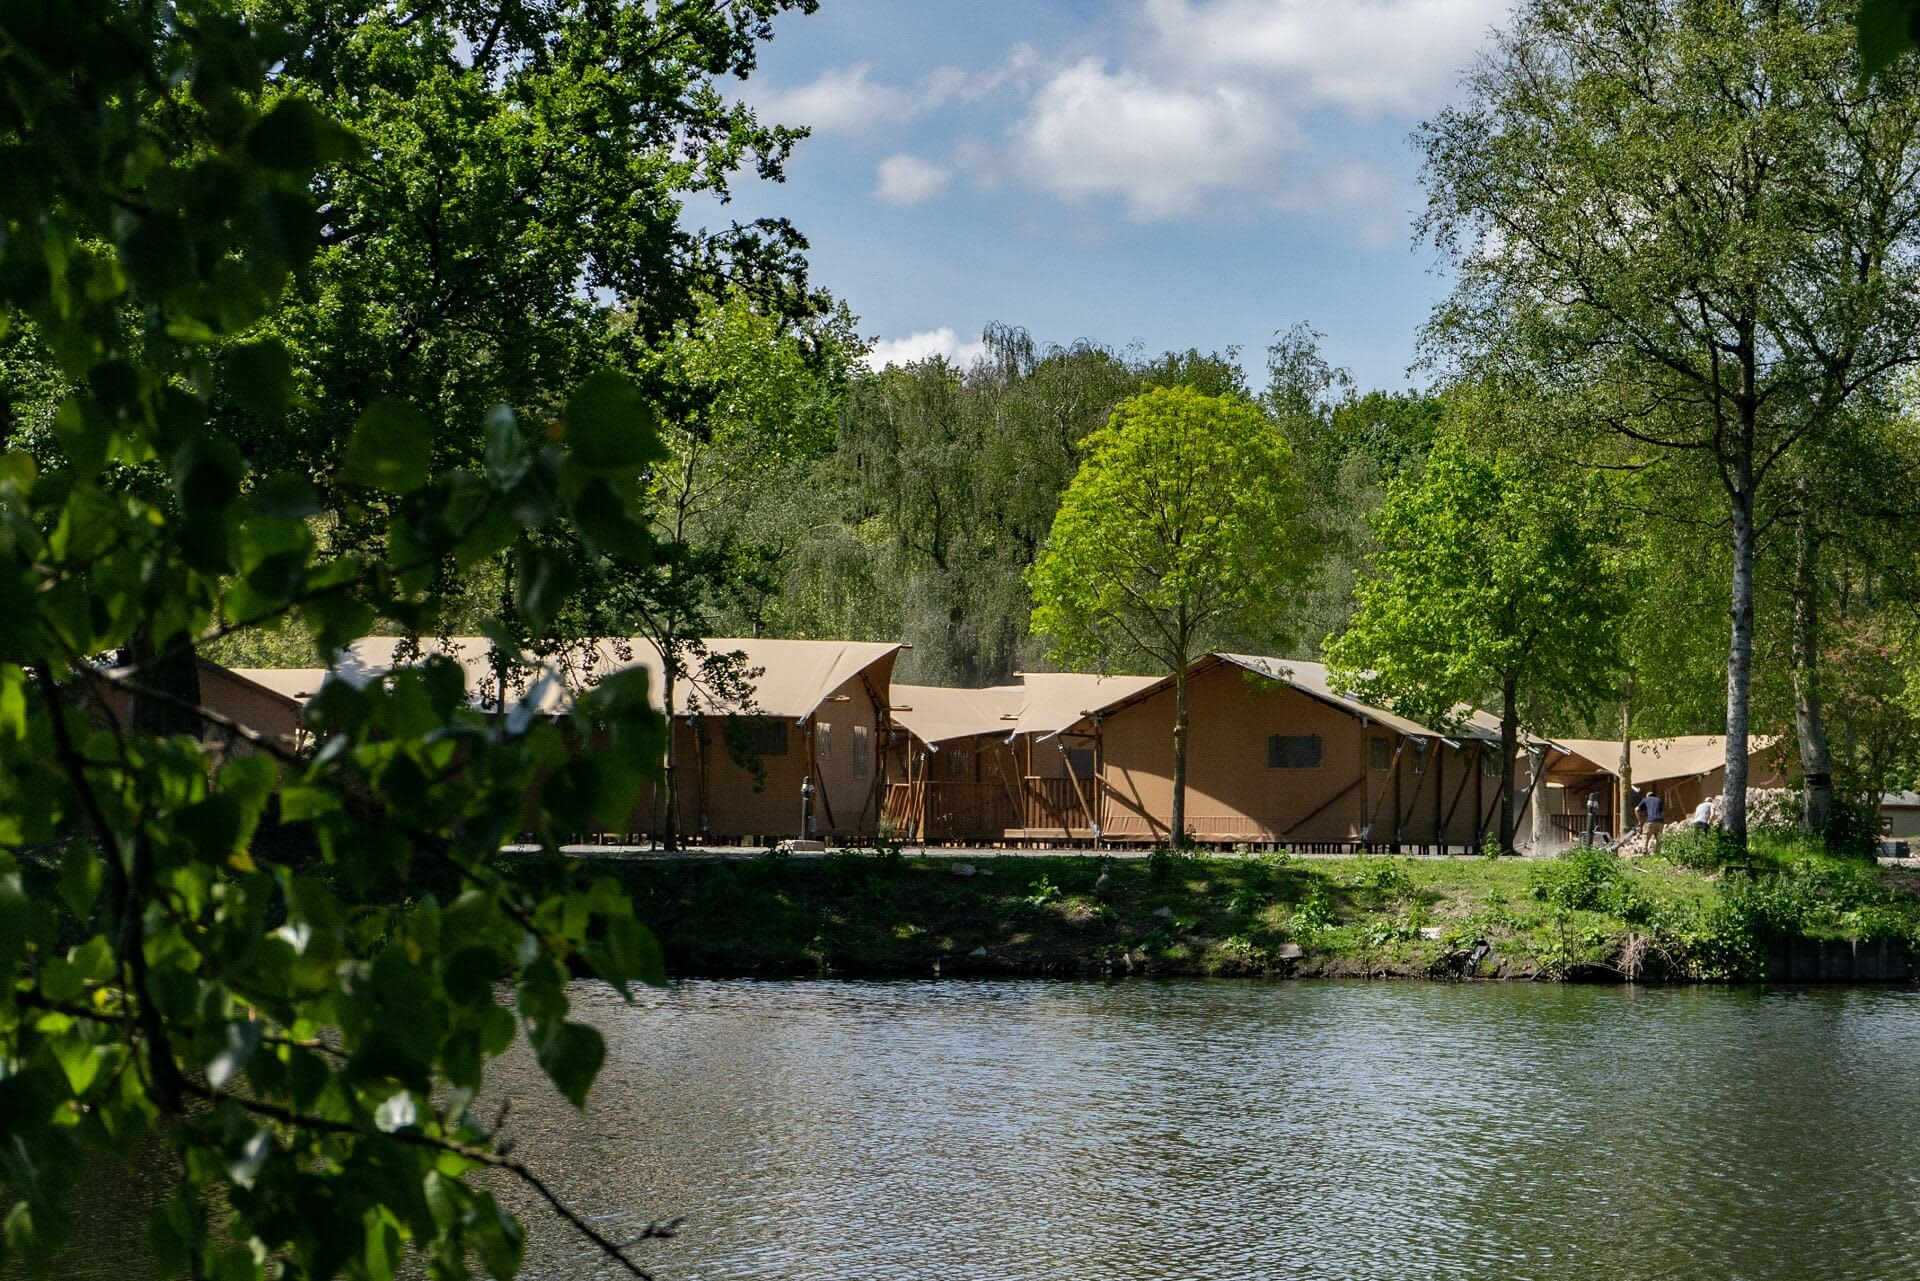 Fotoalbum Citycamping Het Amsterdamse Bos